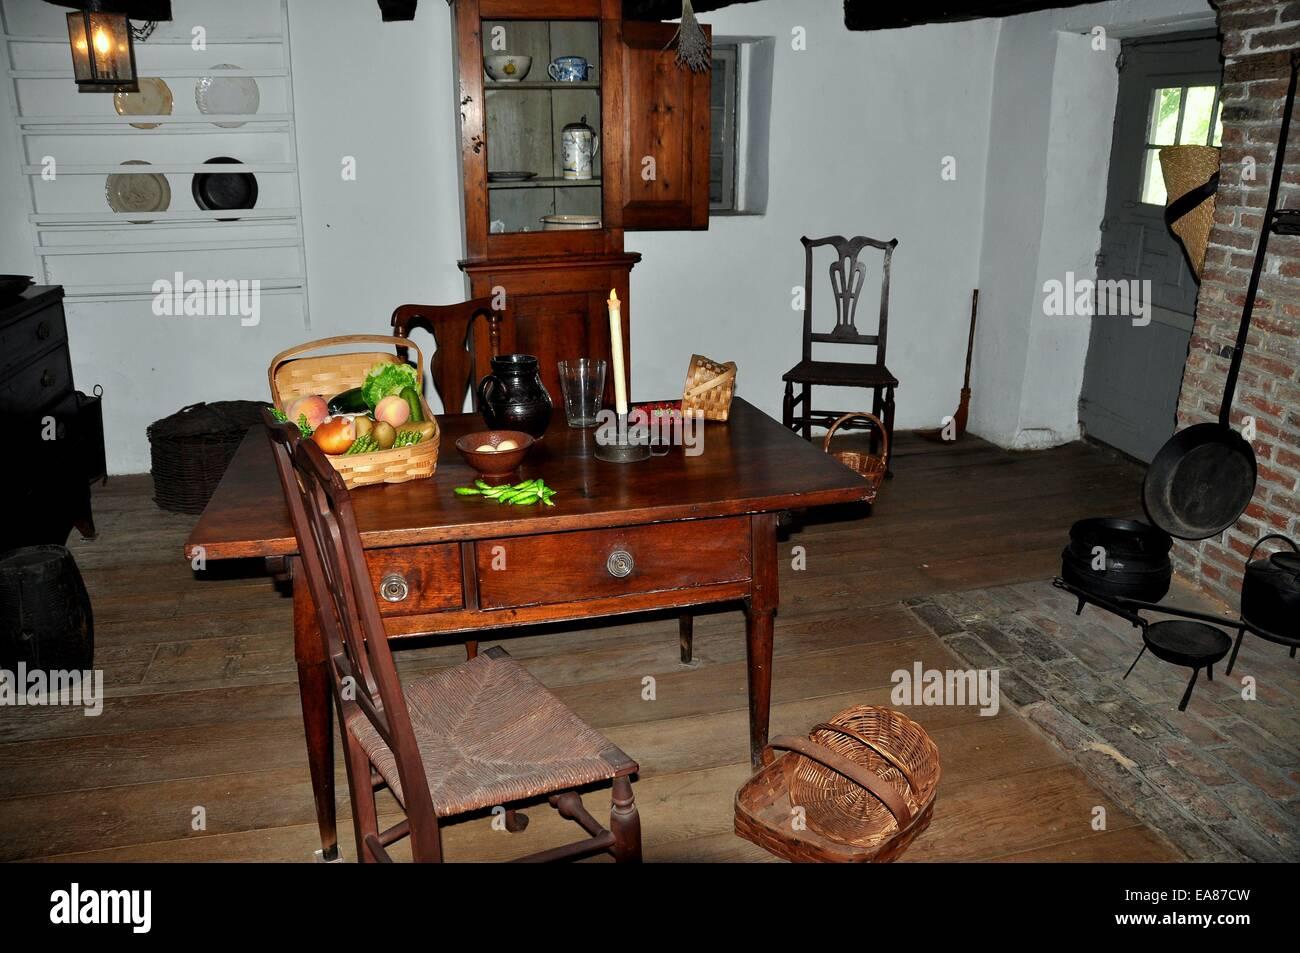 Colonial Nyc Stockfotos & Colonial Nyc Bilder - Alamy